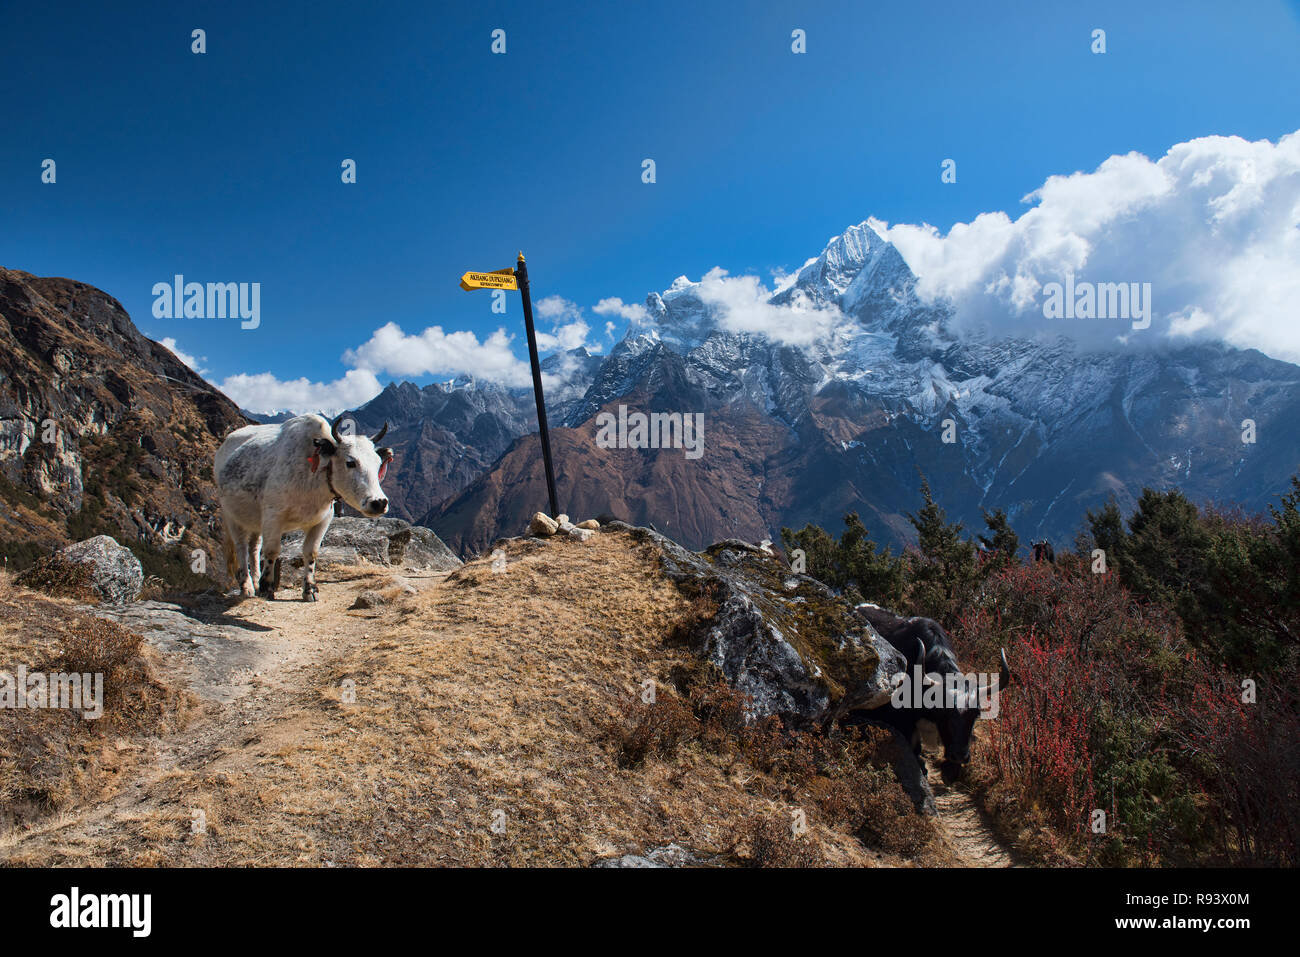 Yak in the Khumbu Valley, Khumjung, Nepal - Stock Image